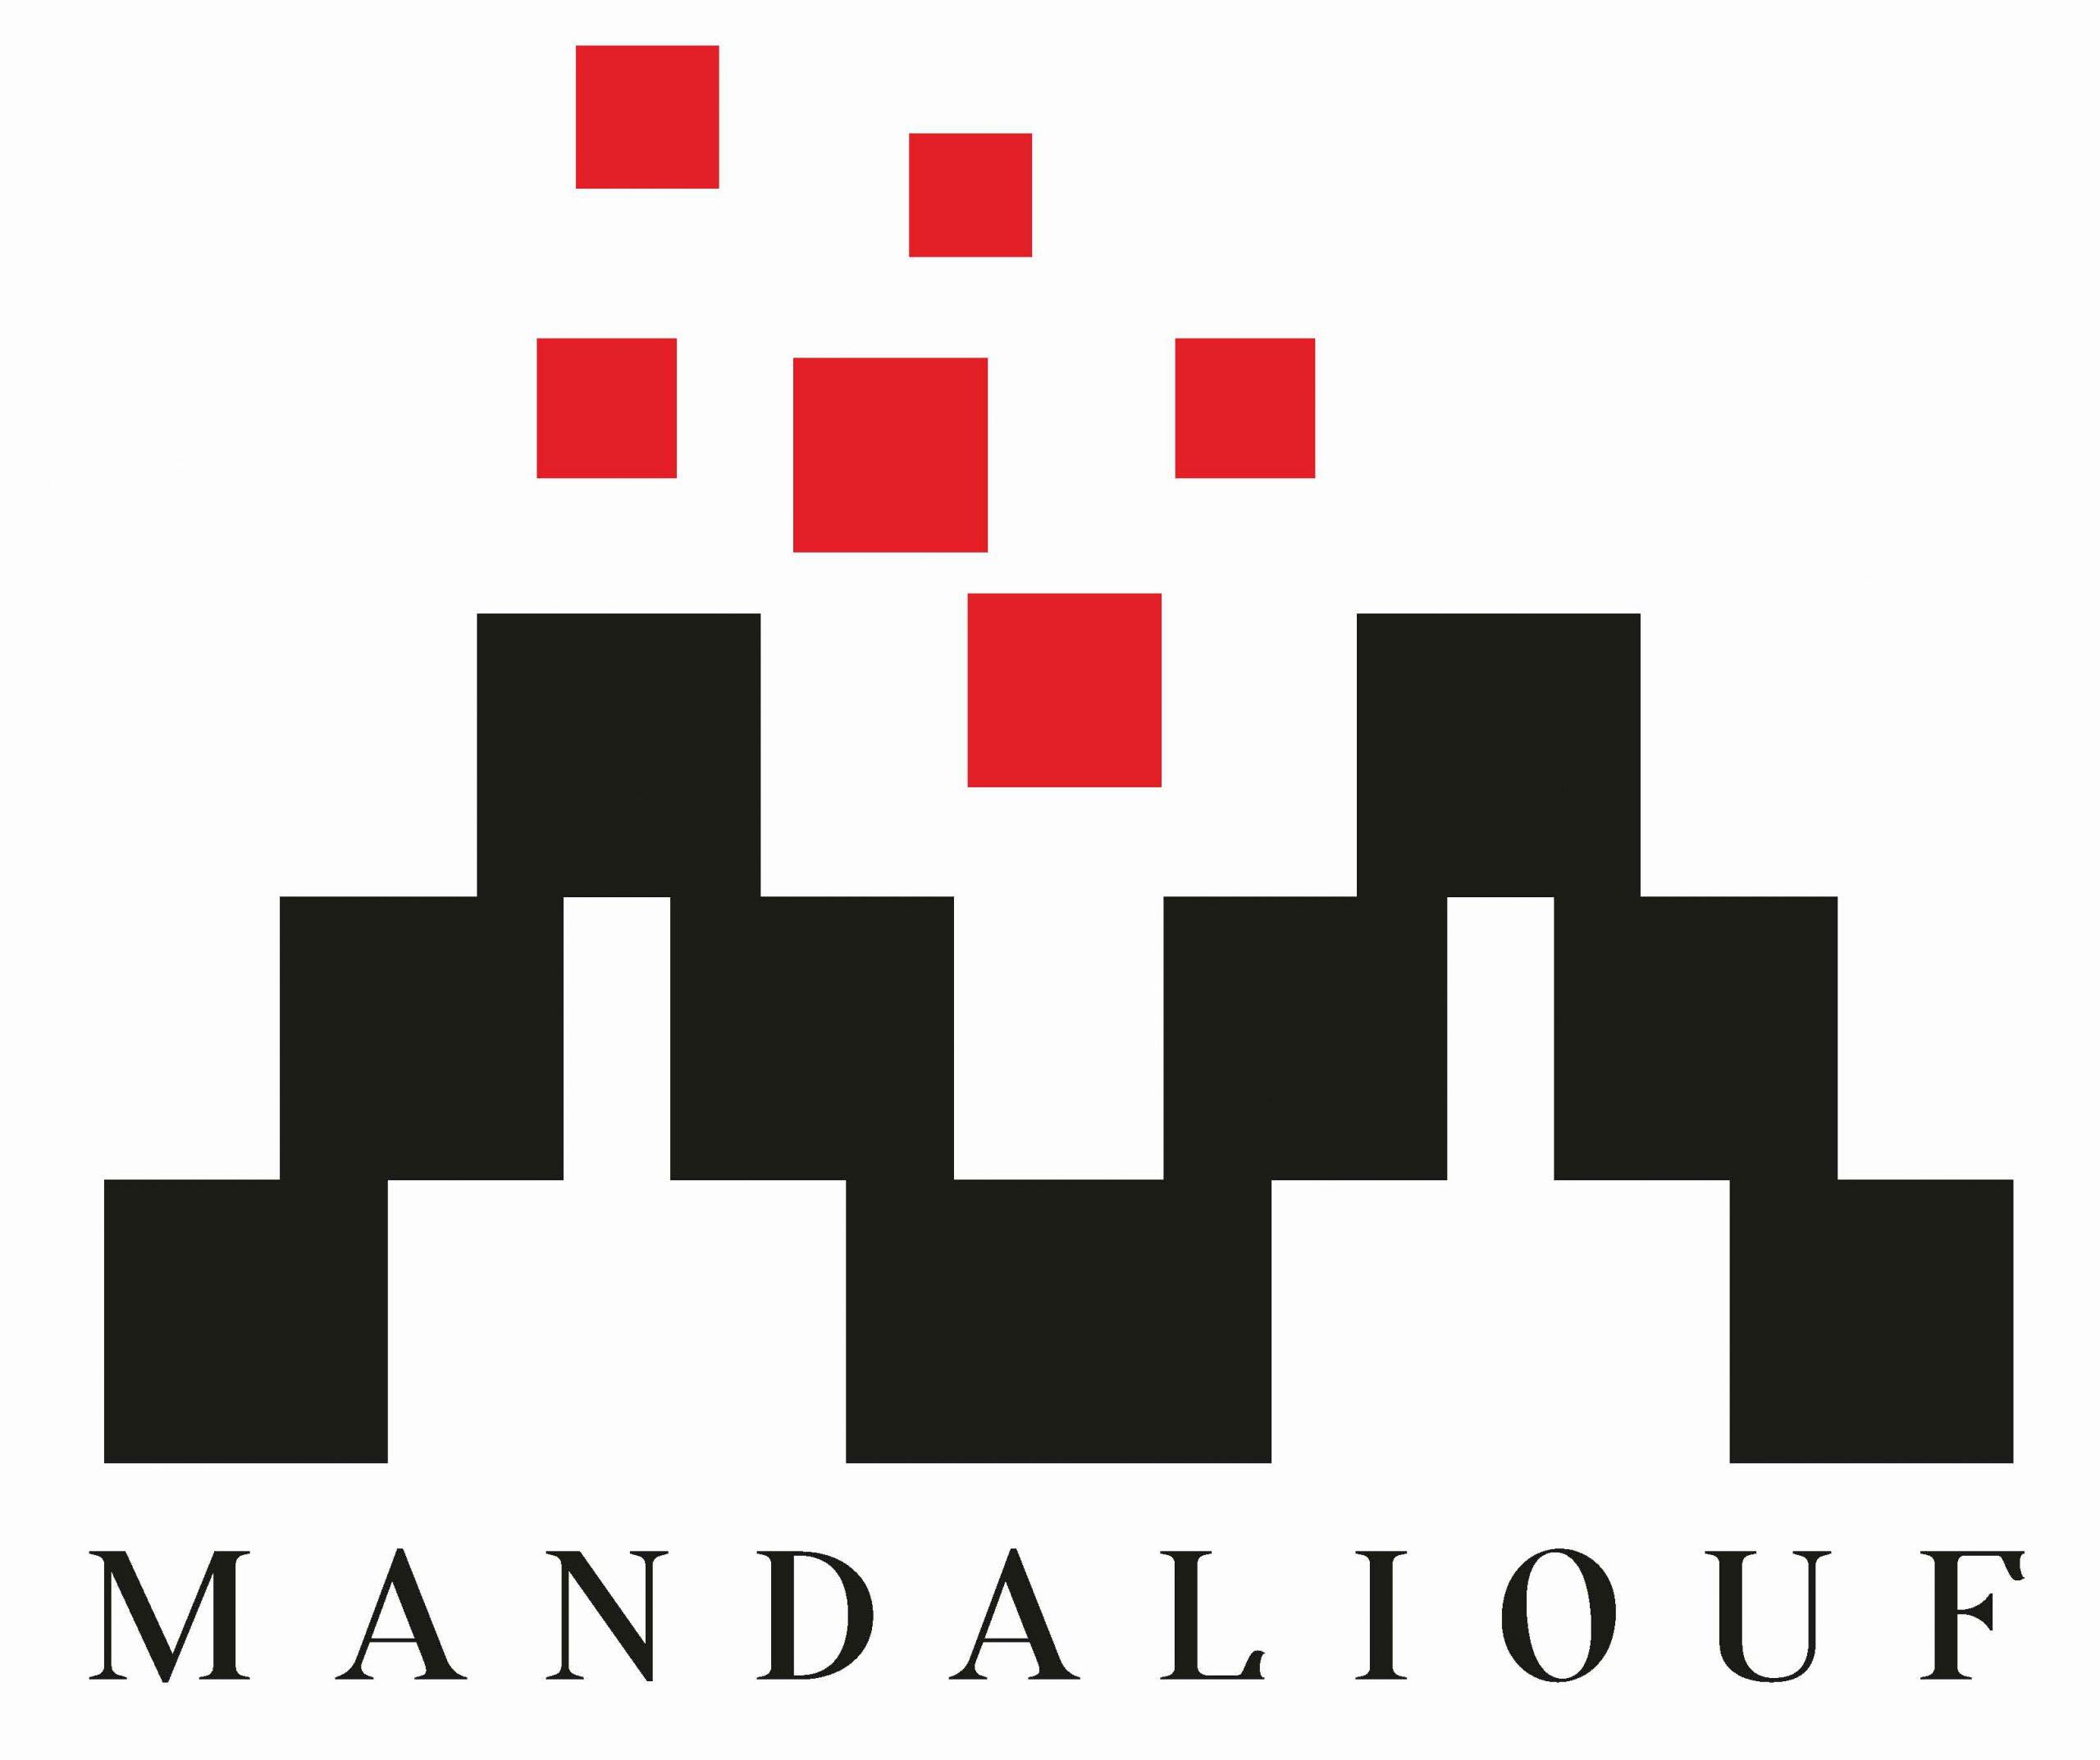 Mandaliouf